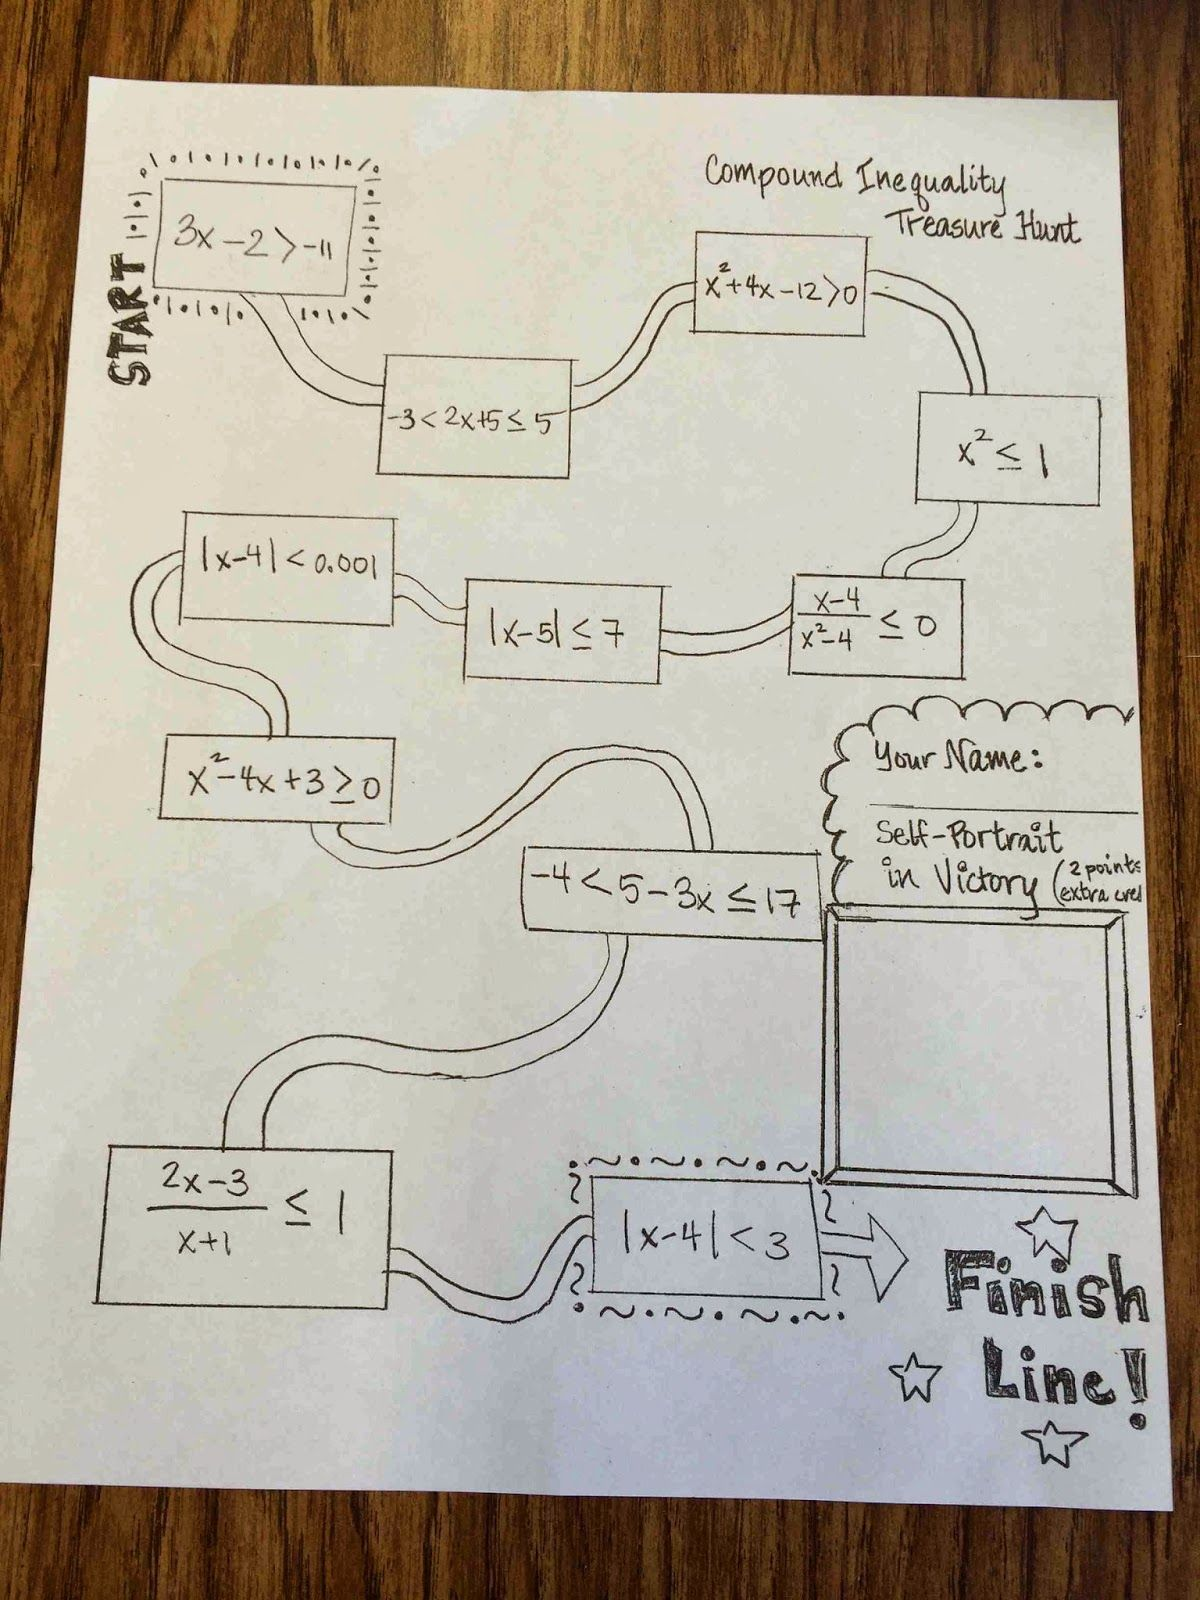 Super Simple Treasure Map Worksheet Idea